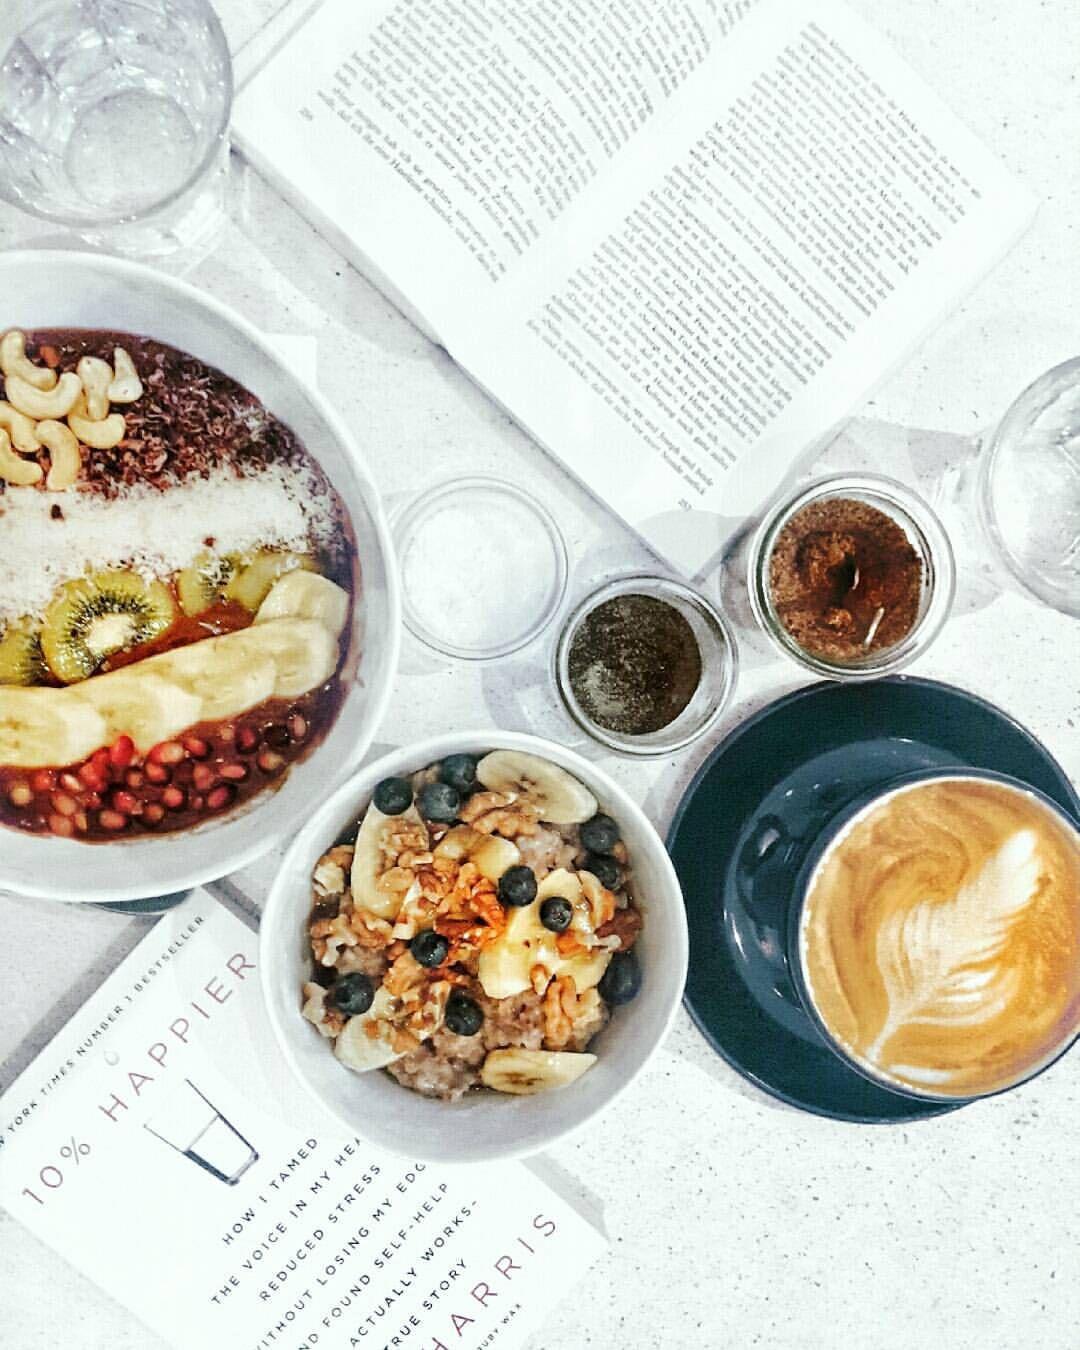 Daluma healthy food in Berlin